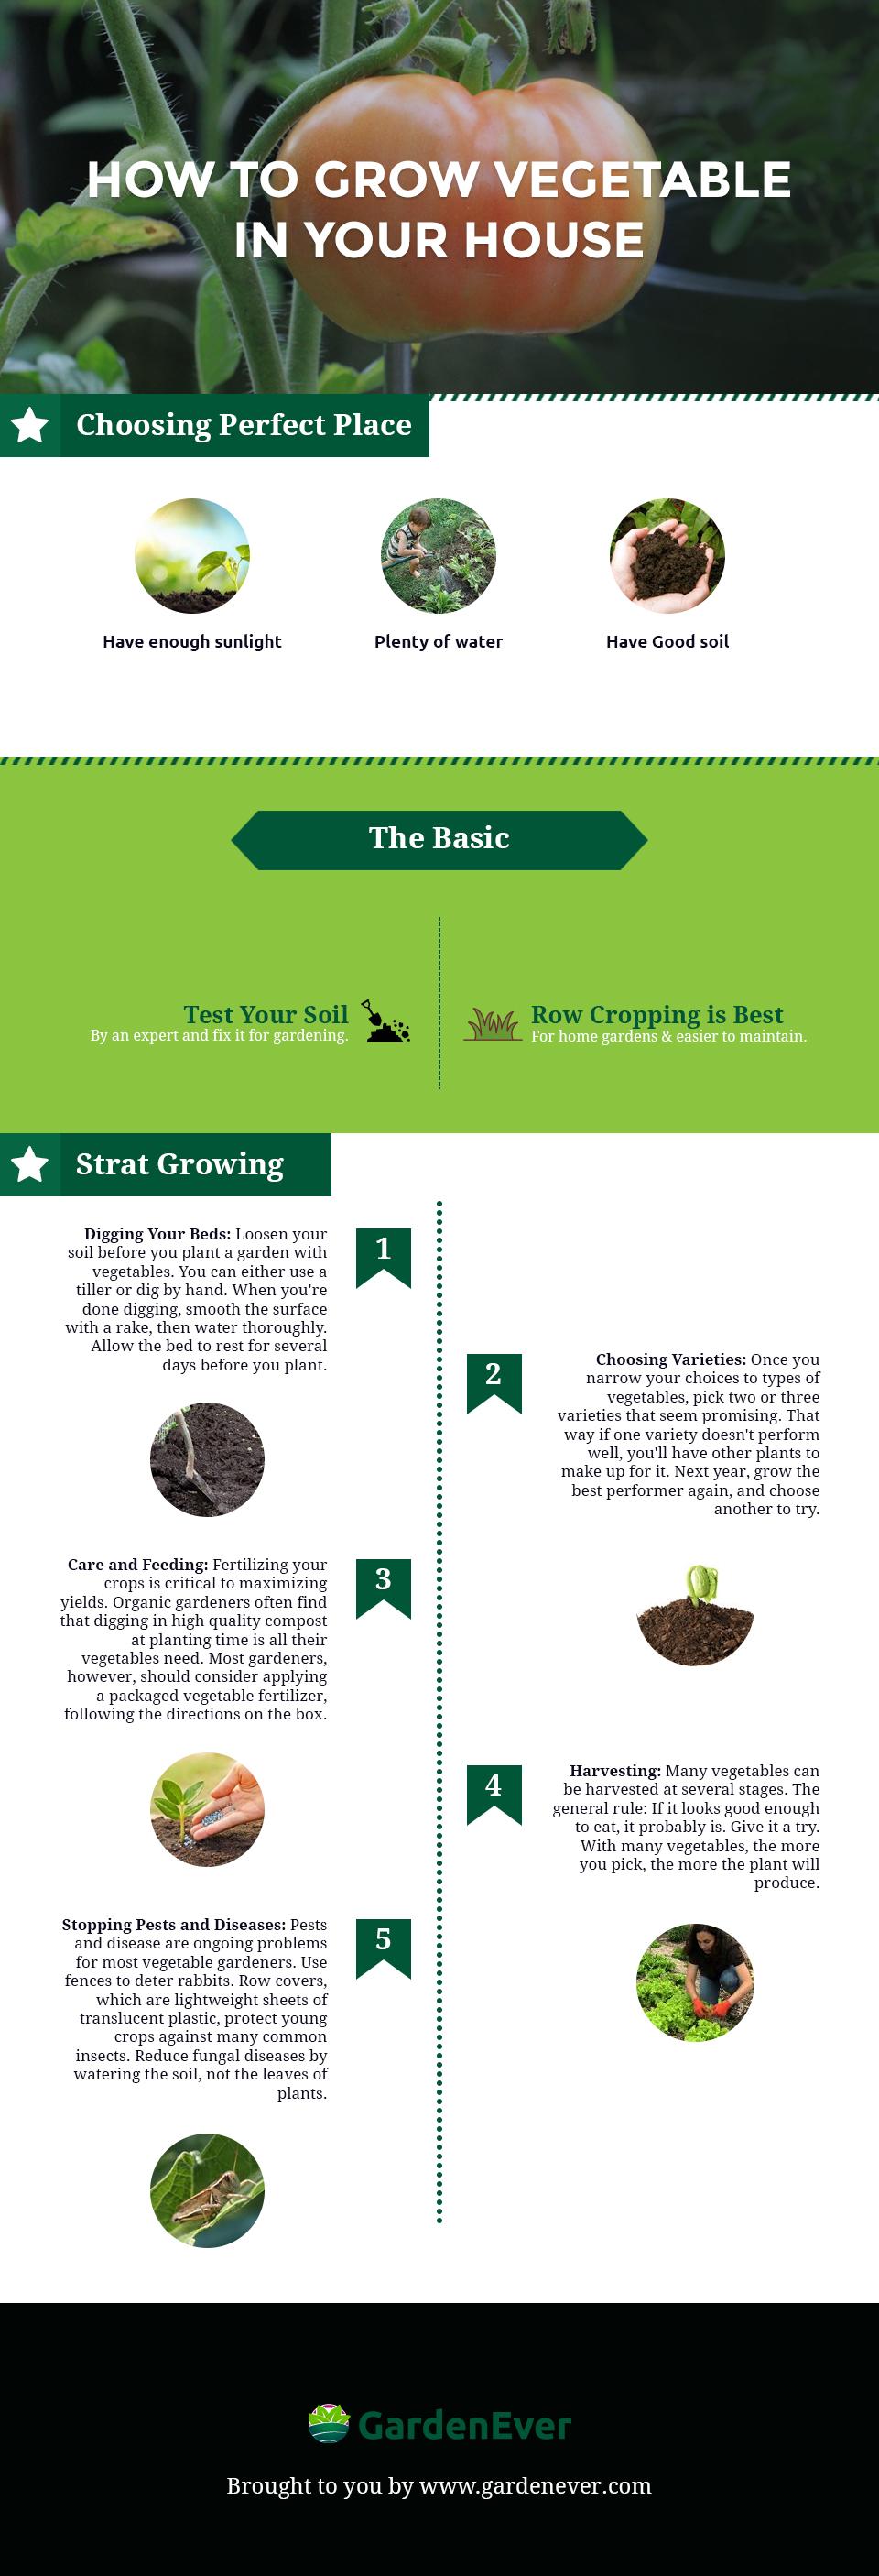 gardenever infographic